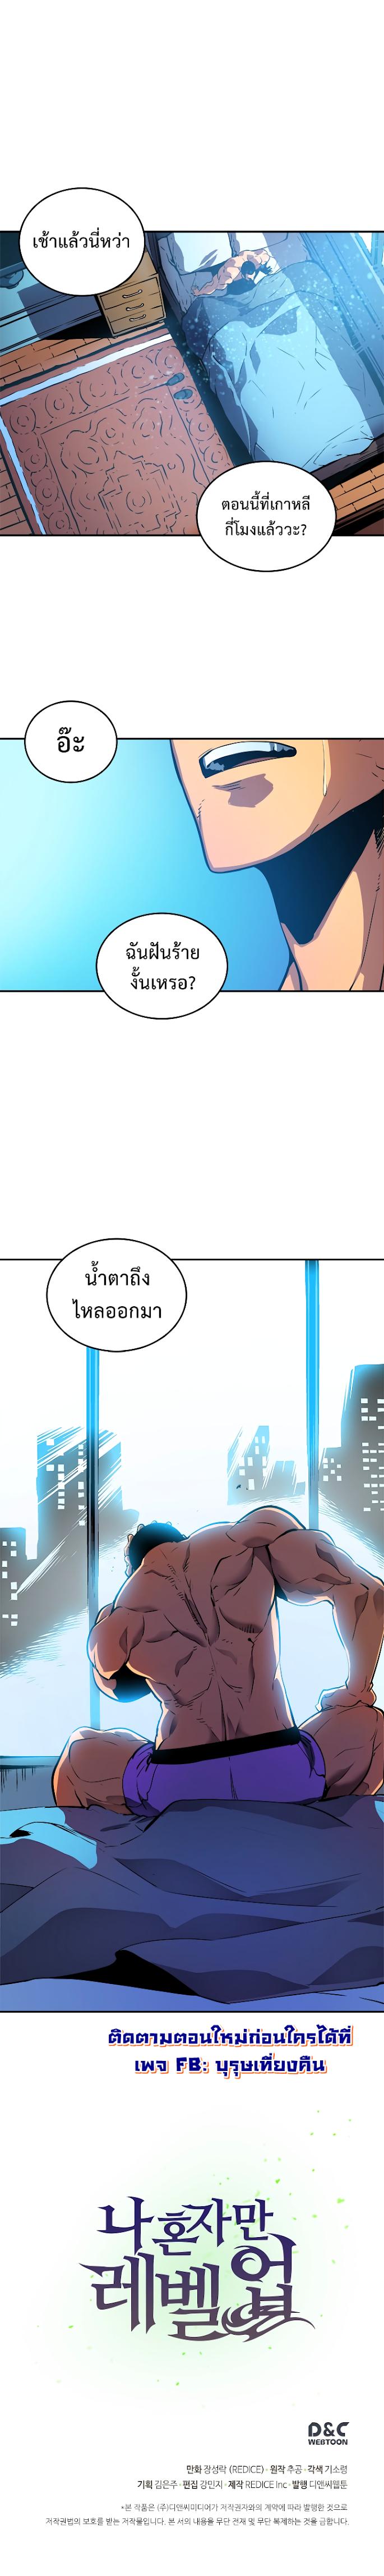 Solo Leveling ตอนที่ 24 TH แปลไทย